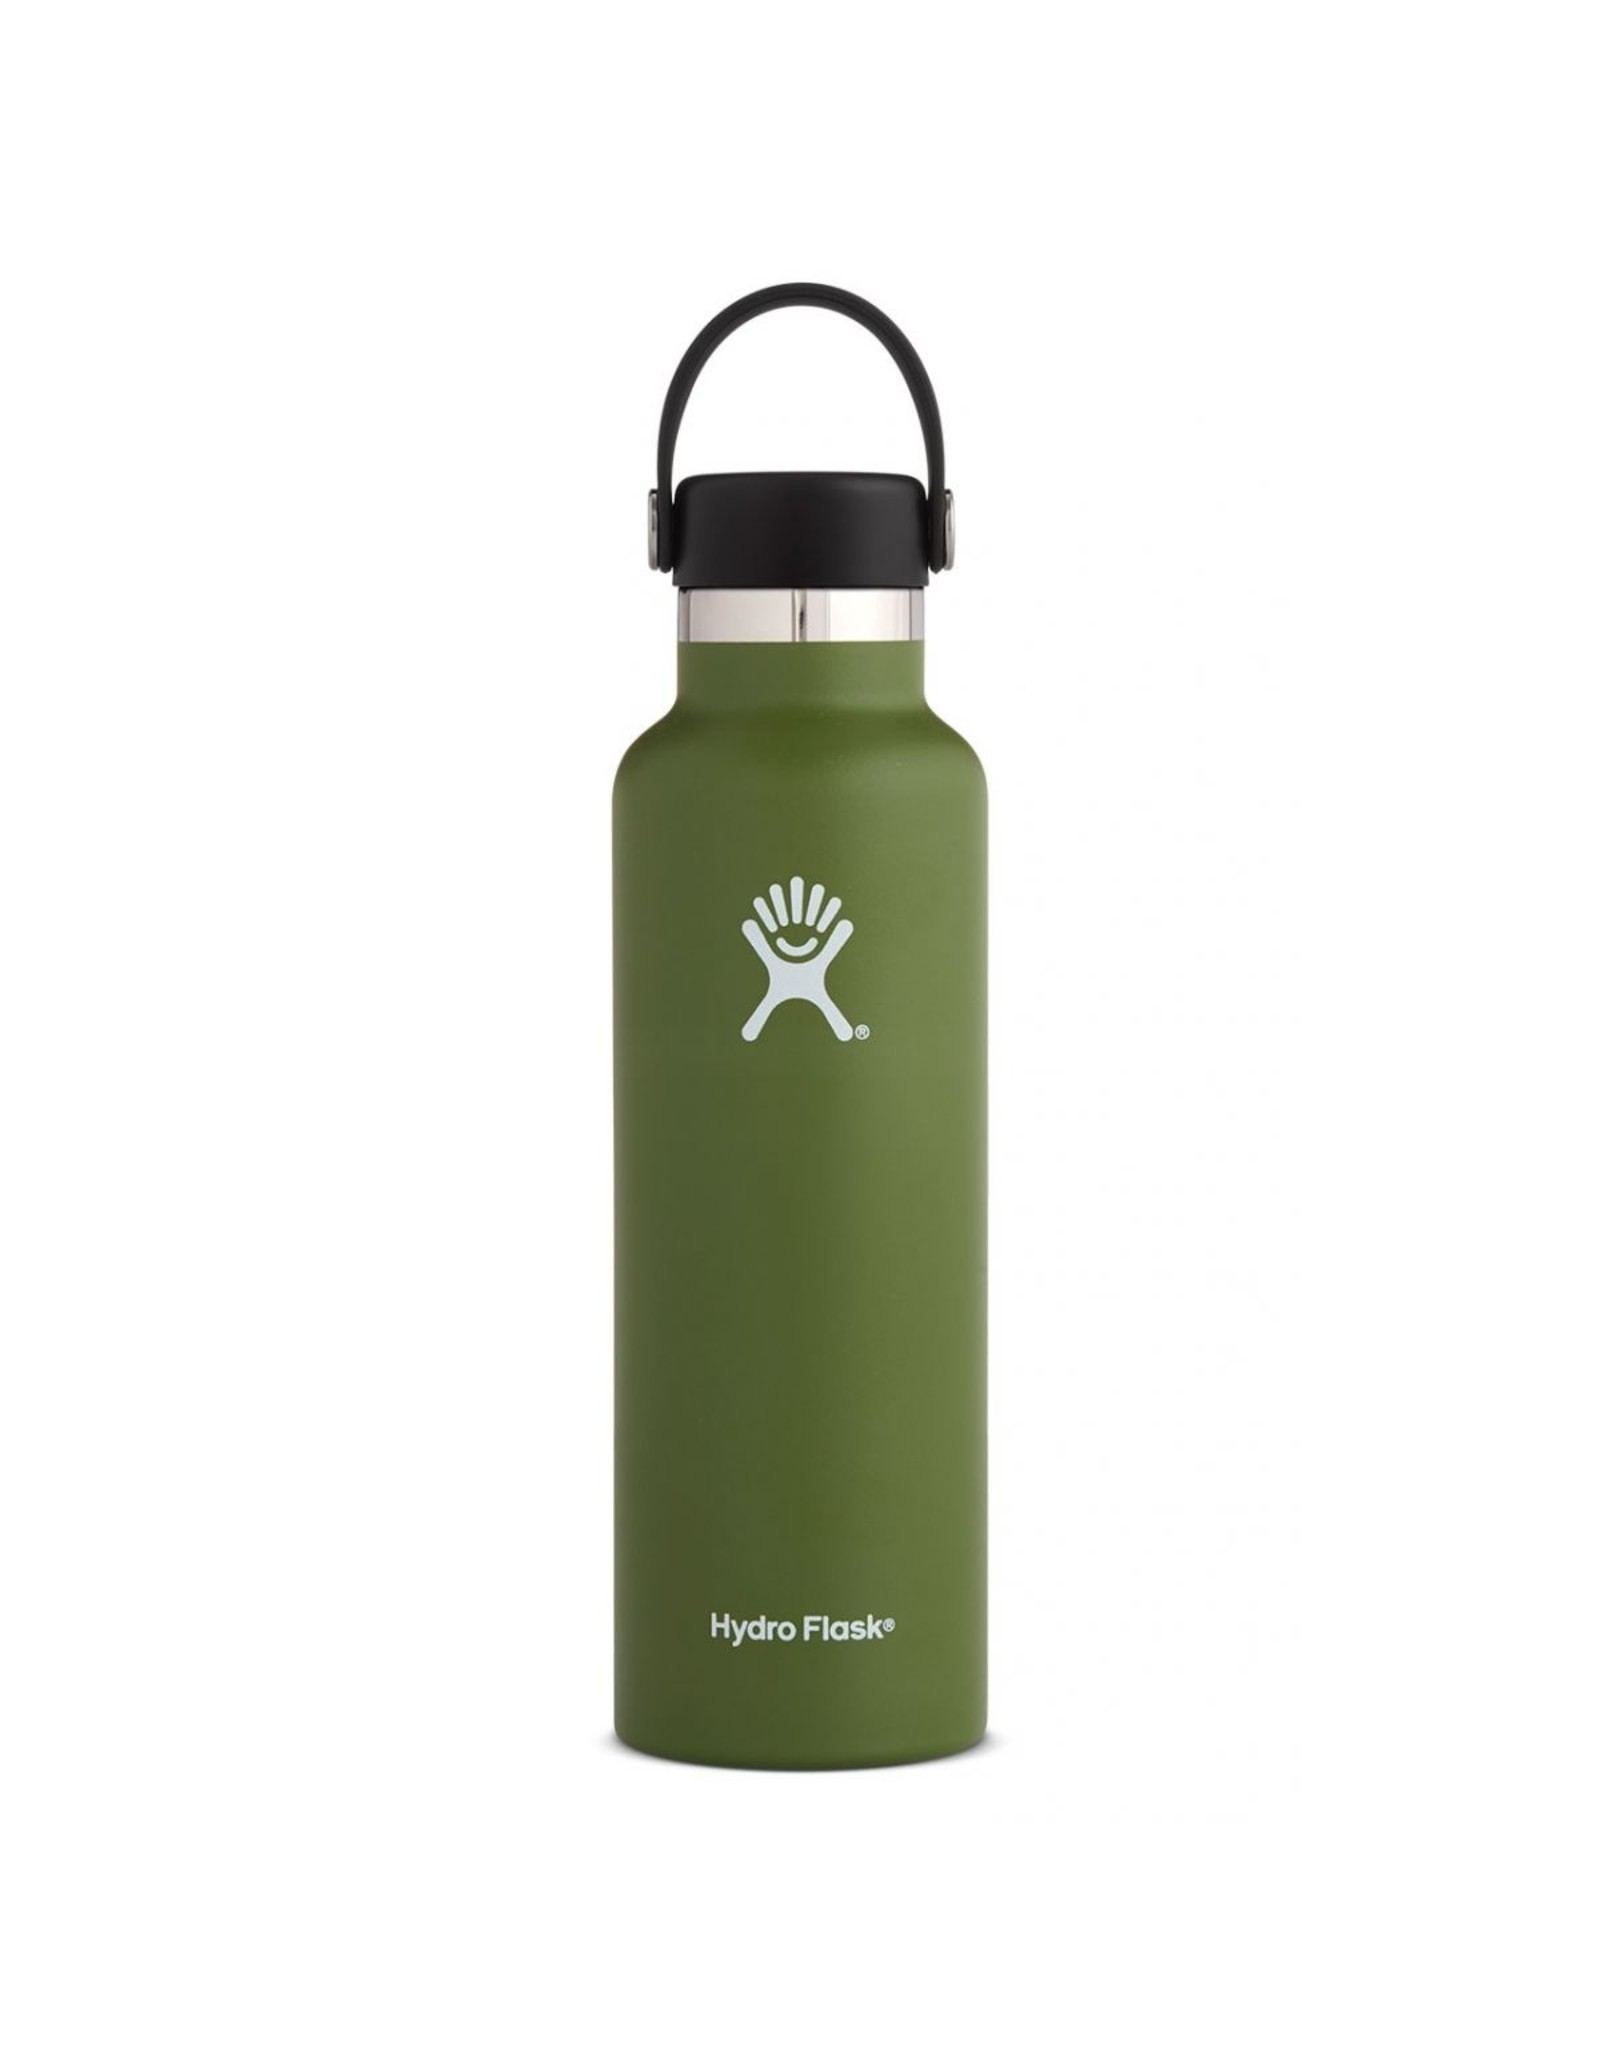 Hydro Flask Hydro Flask 21oz Standard Mouth w/ Flex Cap Olive